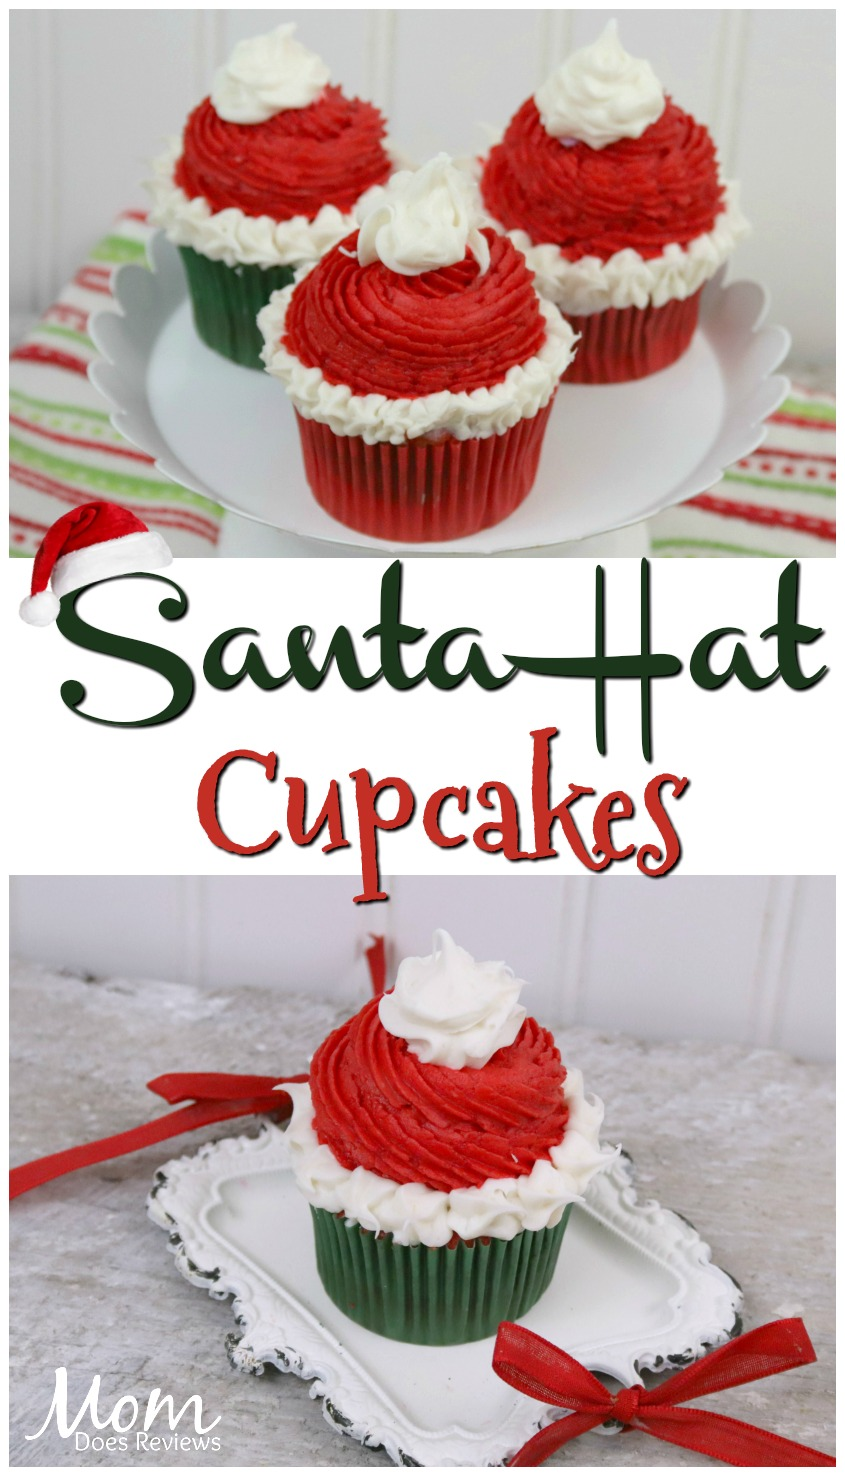 Homemade White Chocolate Santa Hat #cupcakes #recipe #christmas